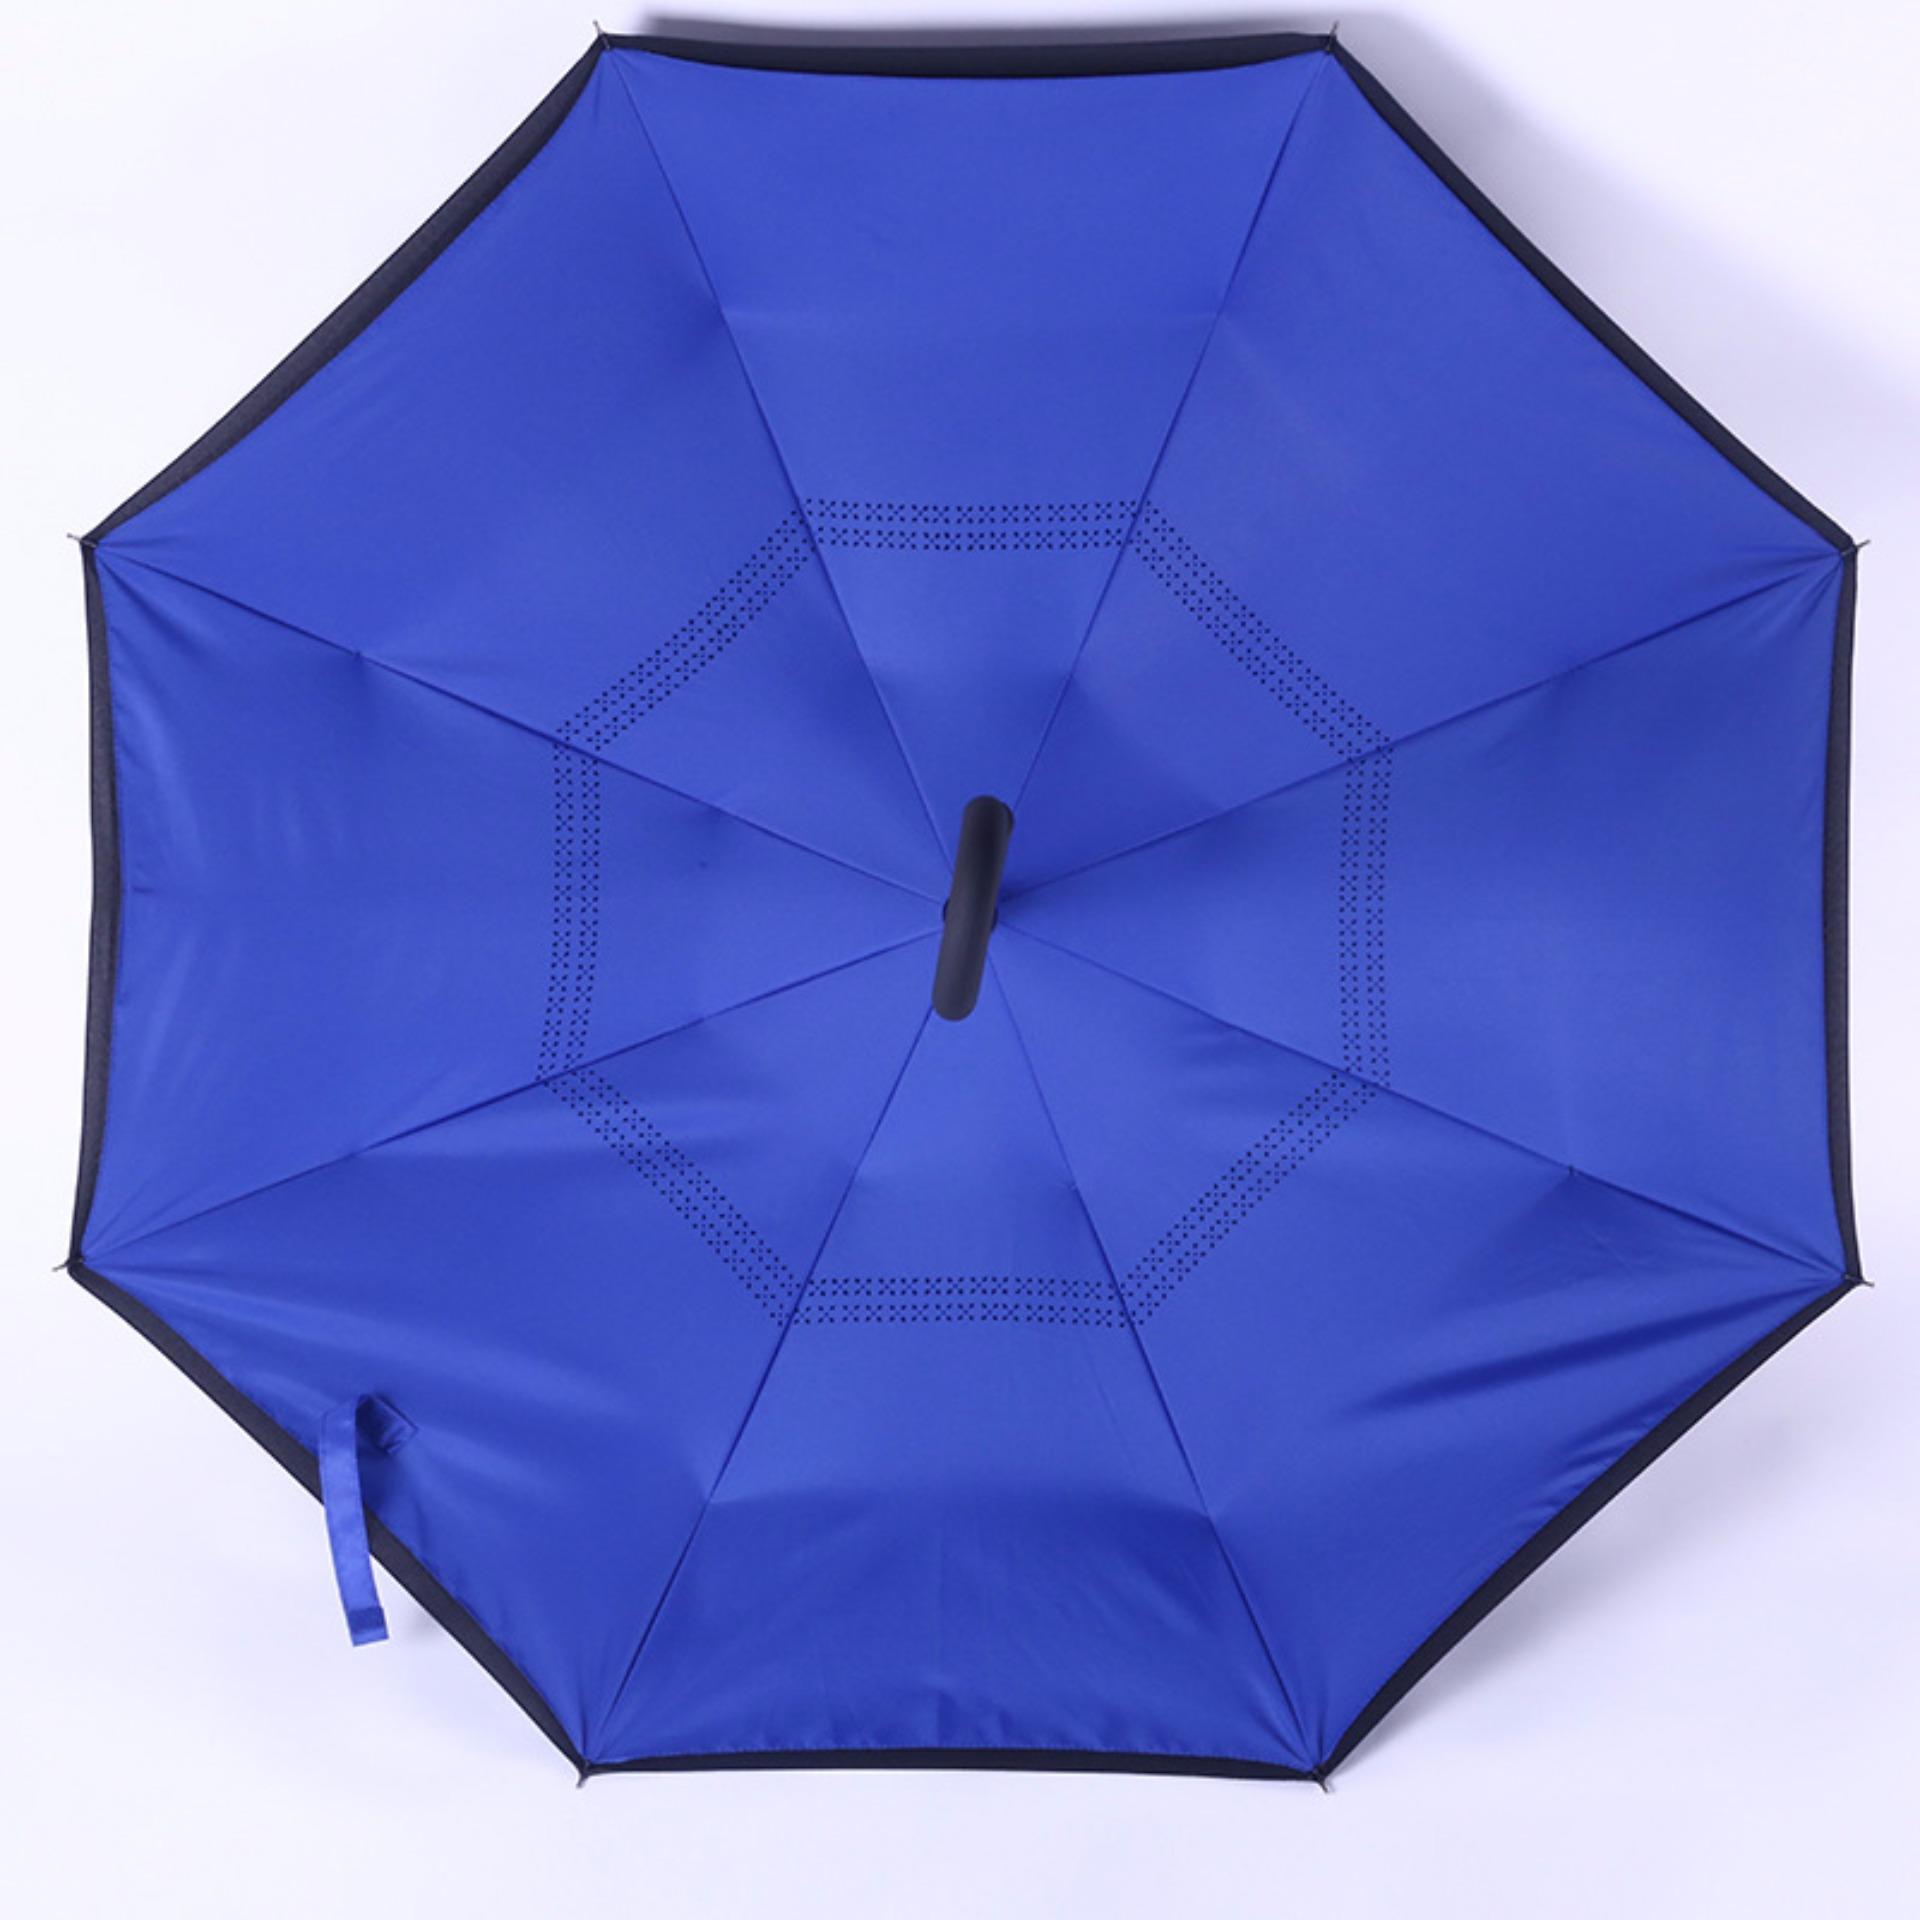 Hot Deals Kazbrella / C-brella - Upside down umbrella / payung terbalik / payung